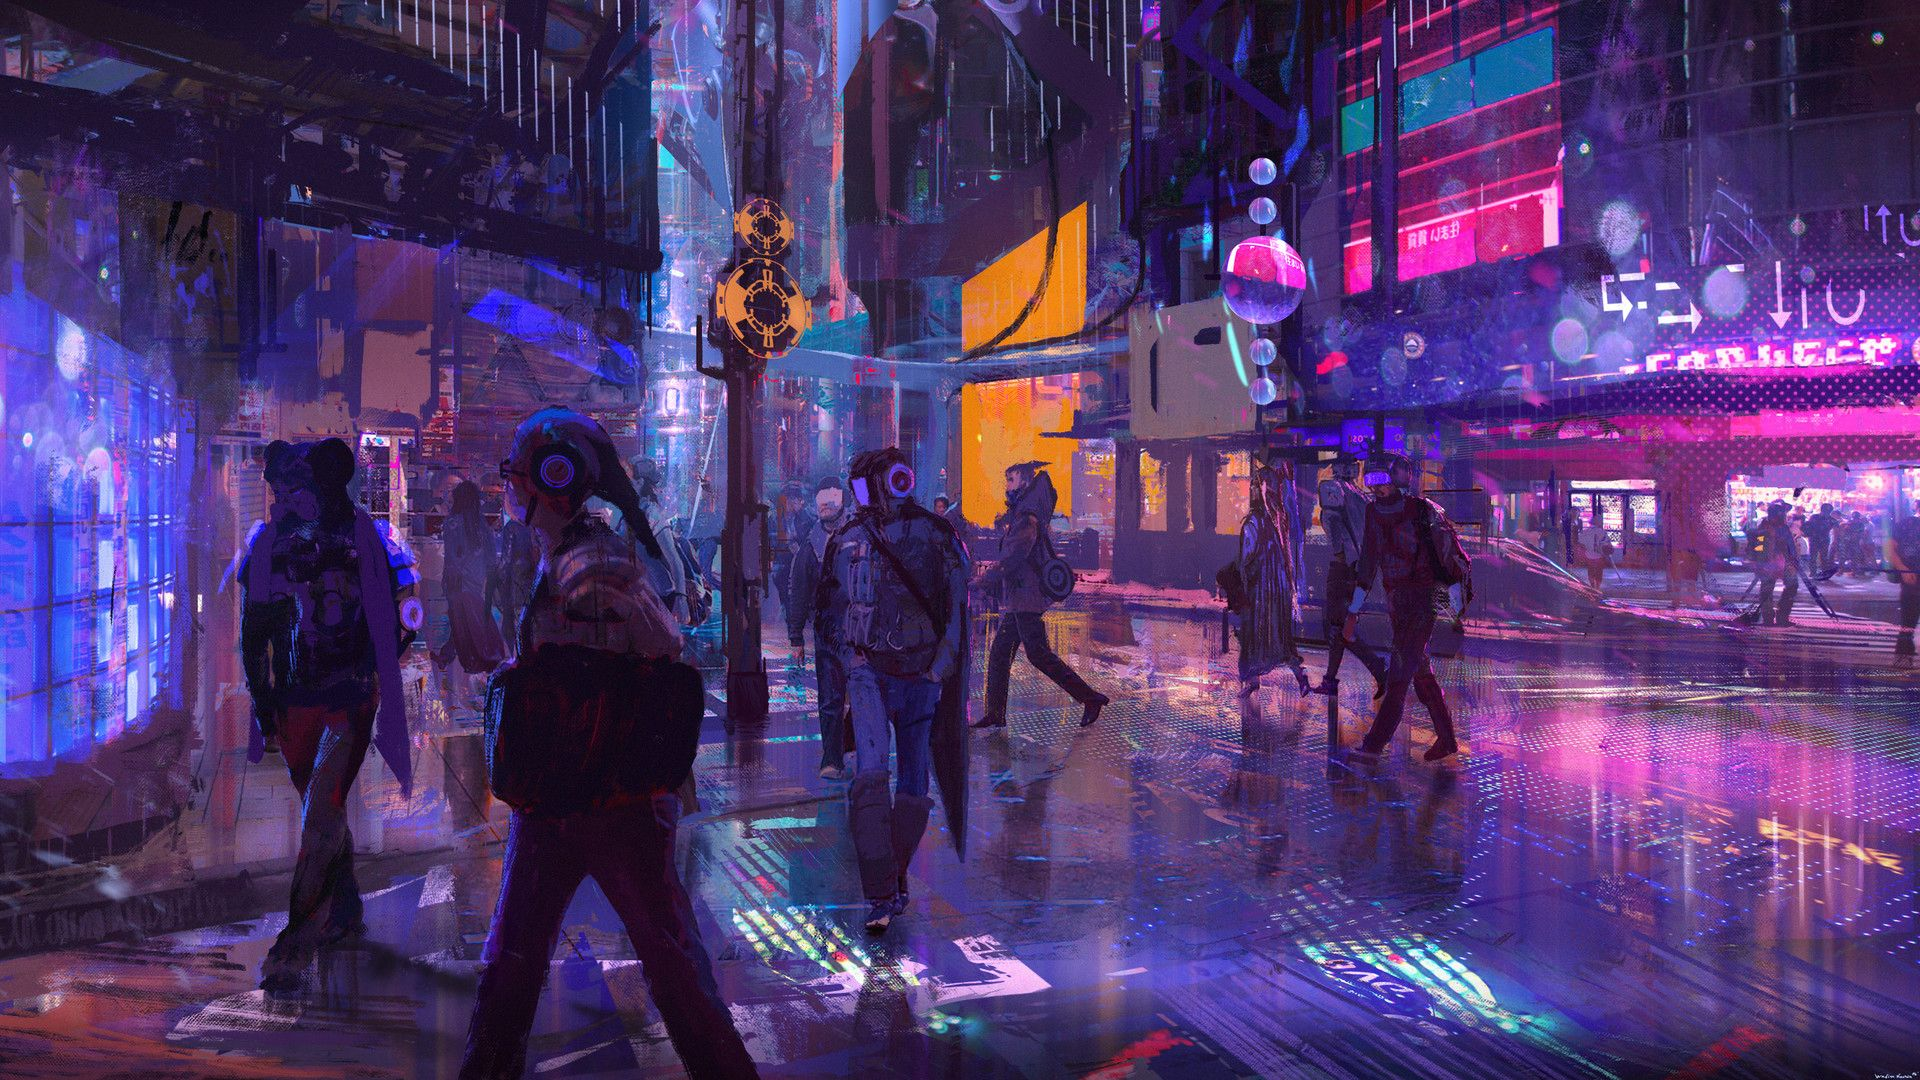 Science Fiction Wallpapers 1920x1080 Cyberpunk City Cyberpunk Art Cyberpunk Street